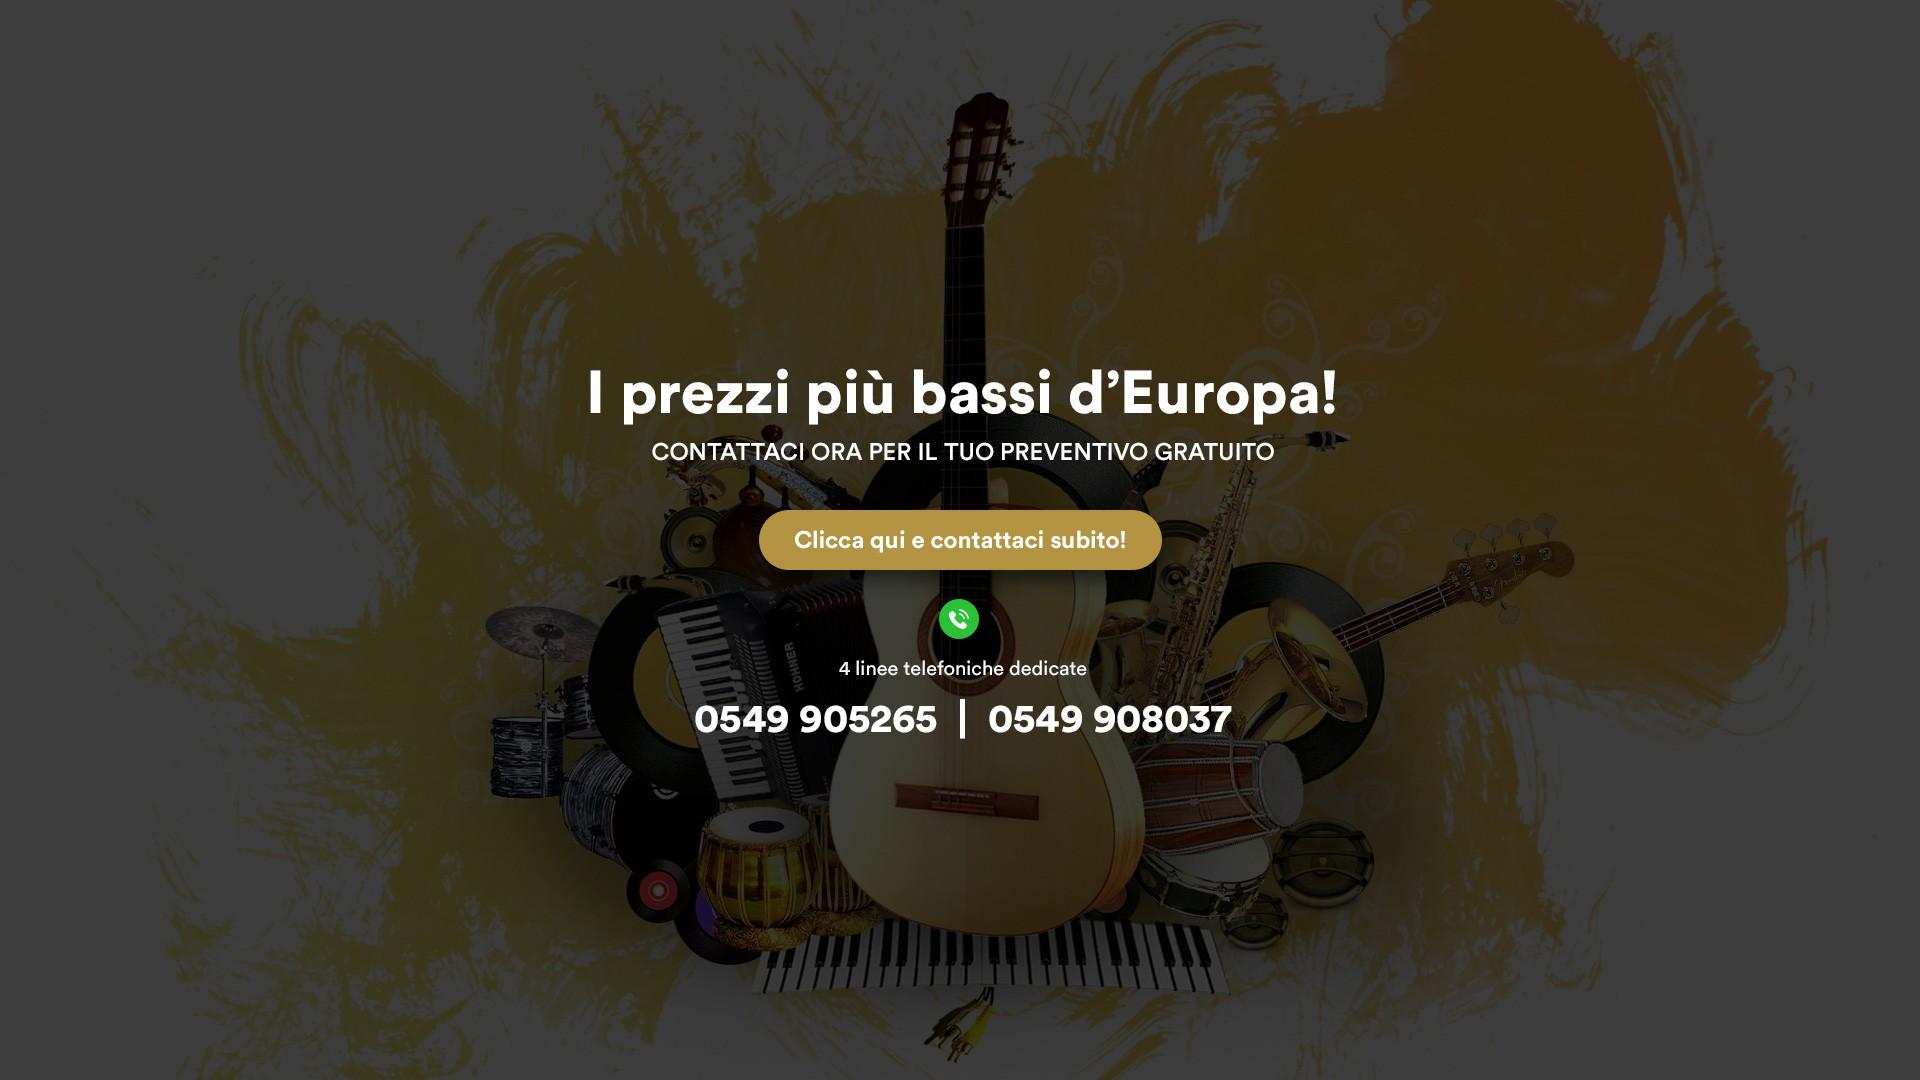 Strumenti musicali San Marino - Strumenti Musicali Marino Baldacci